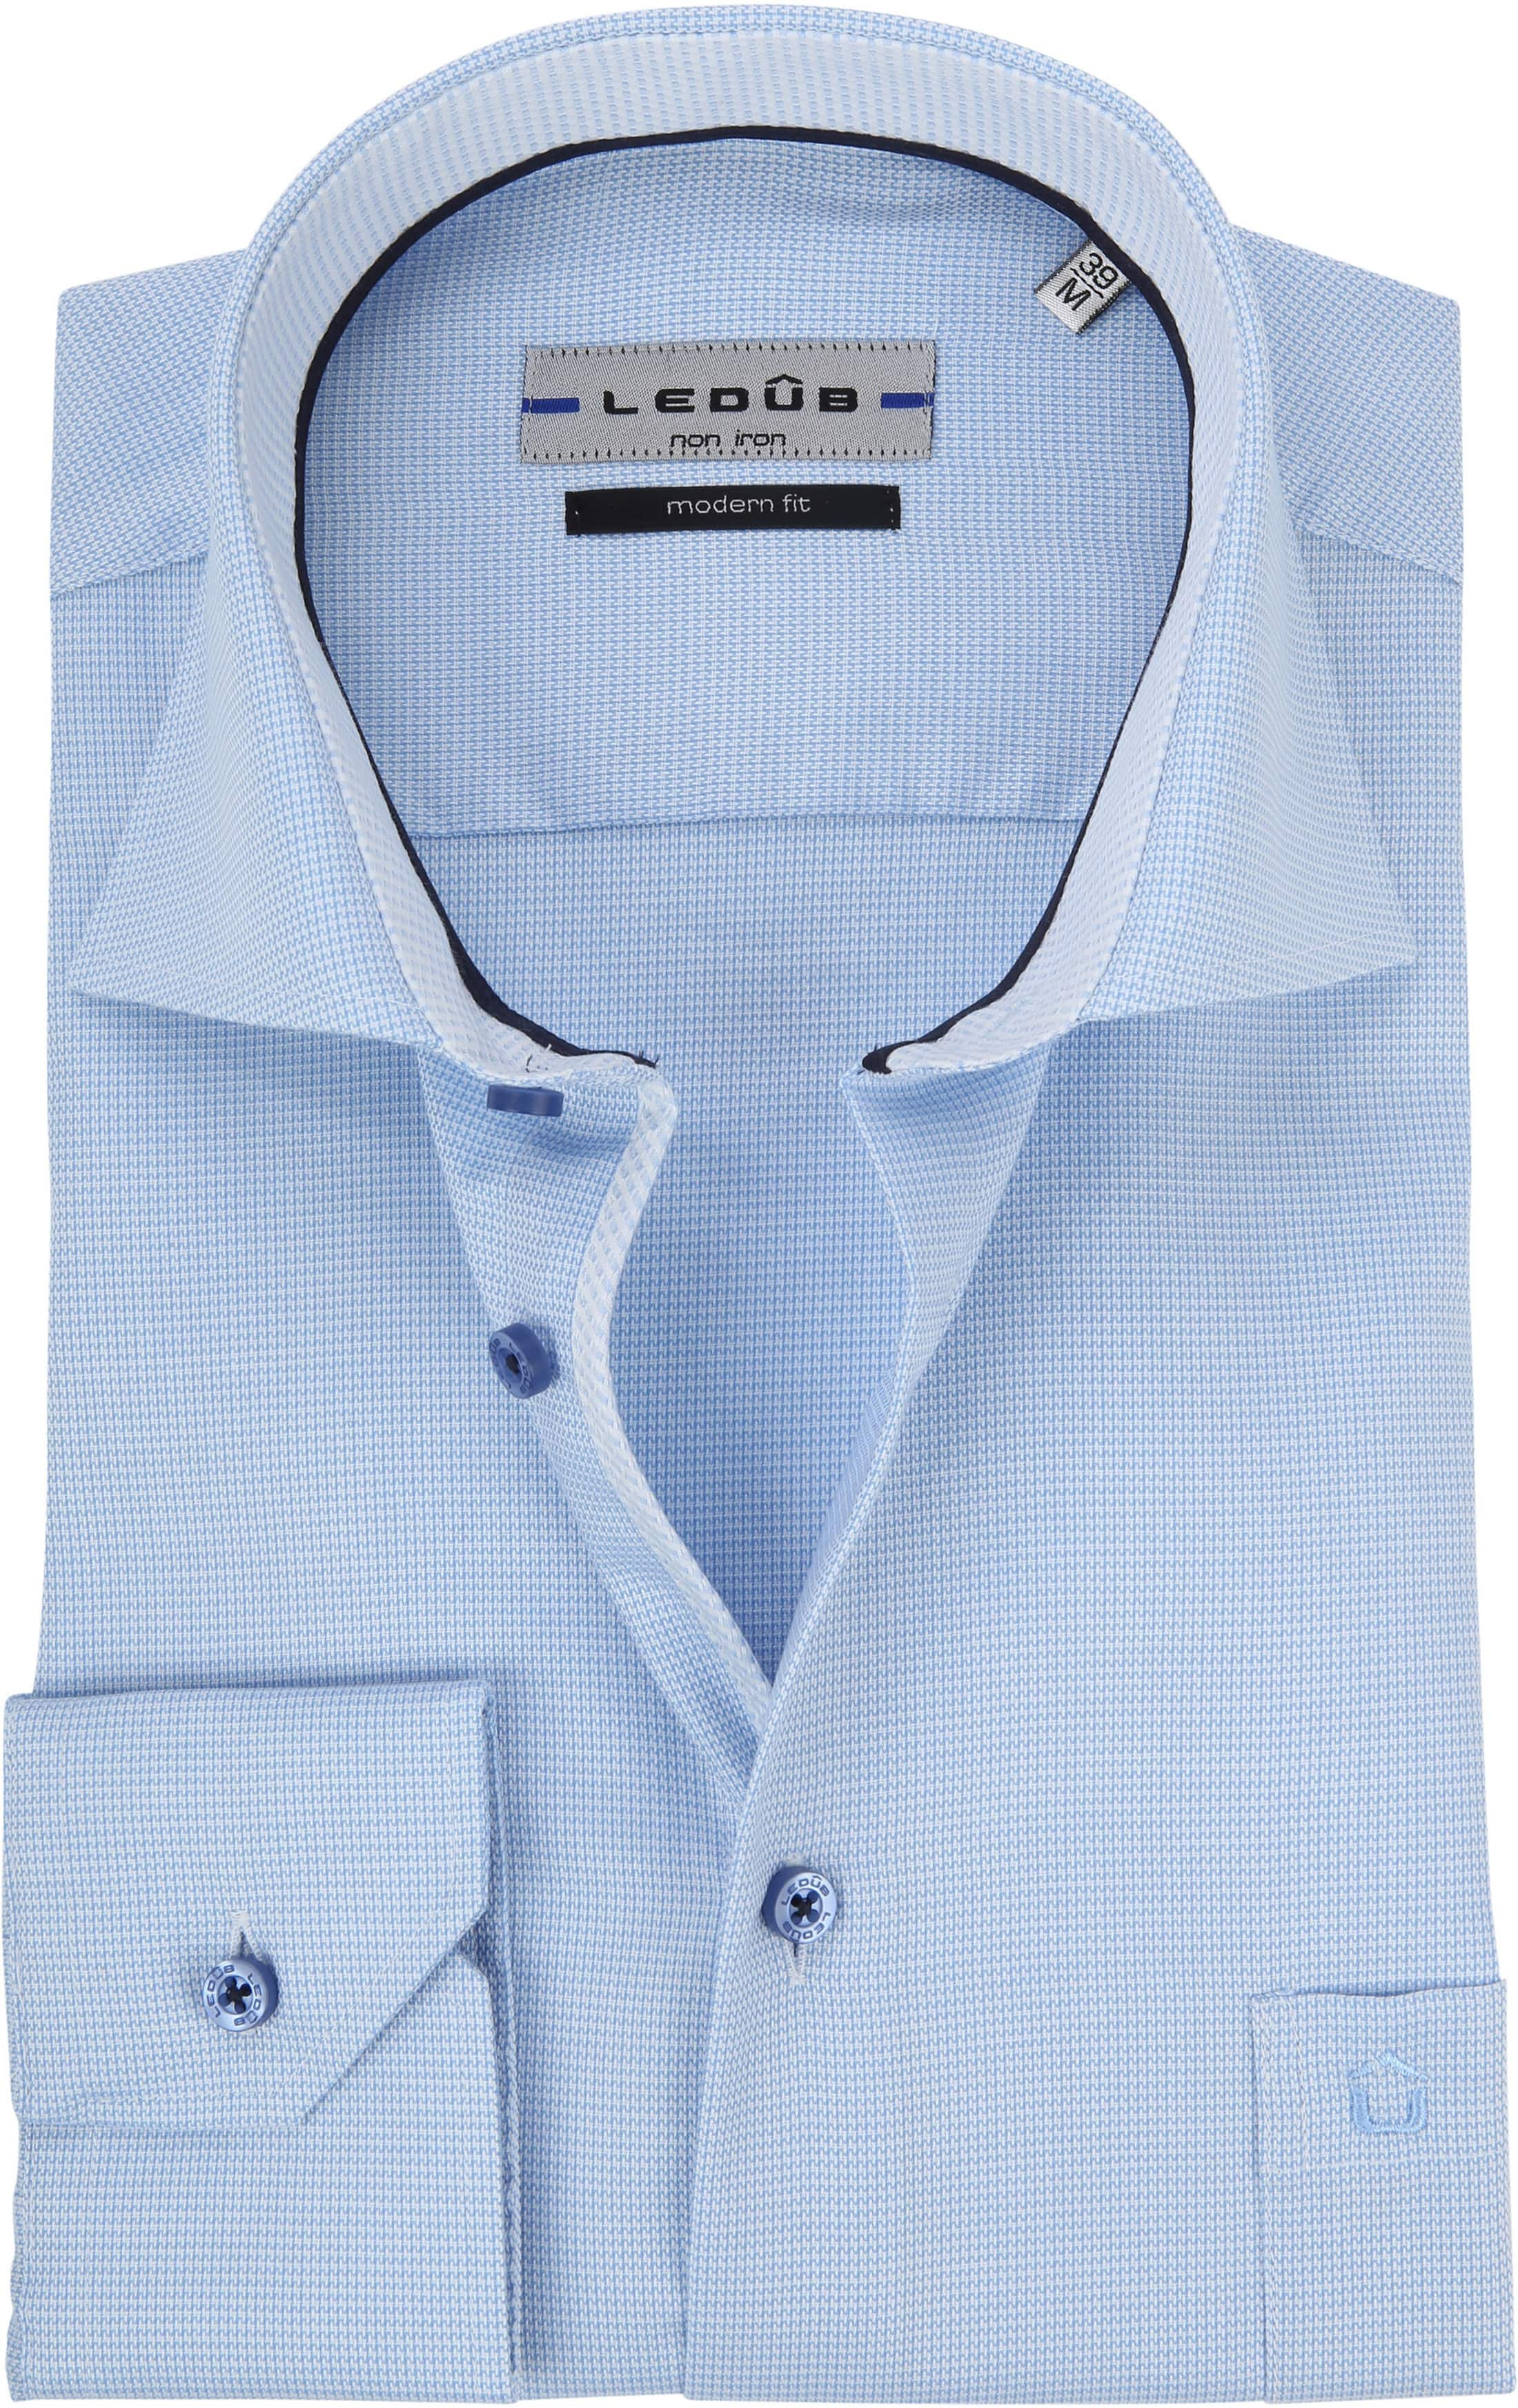 Ledub Overhemd Blauw Non Iron MF foto 0